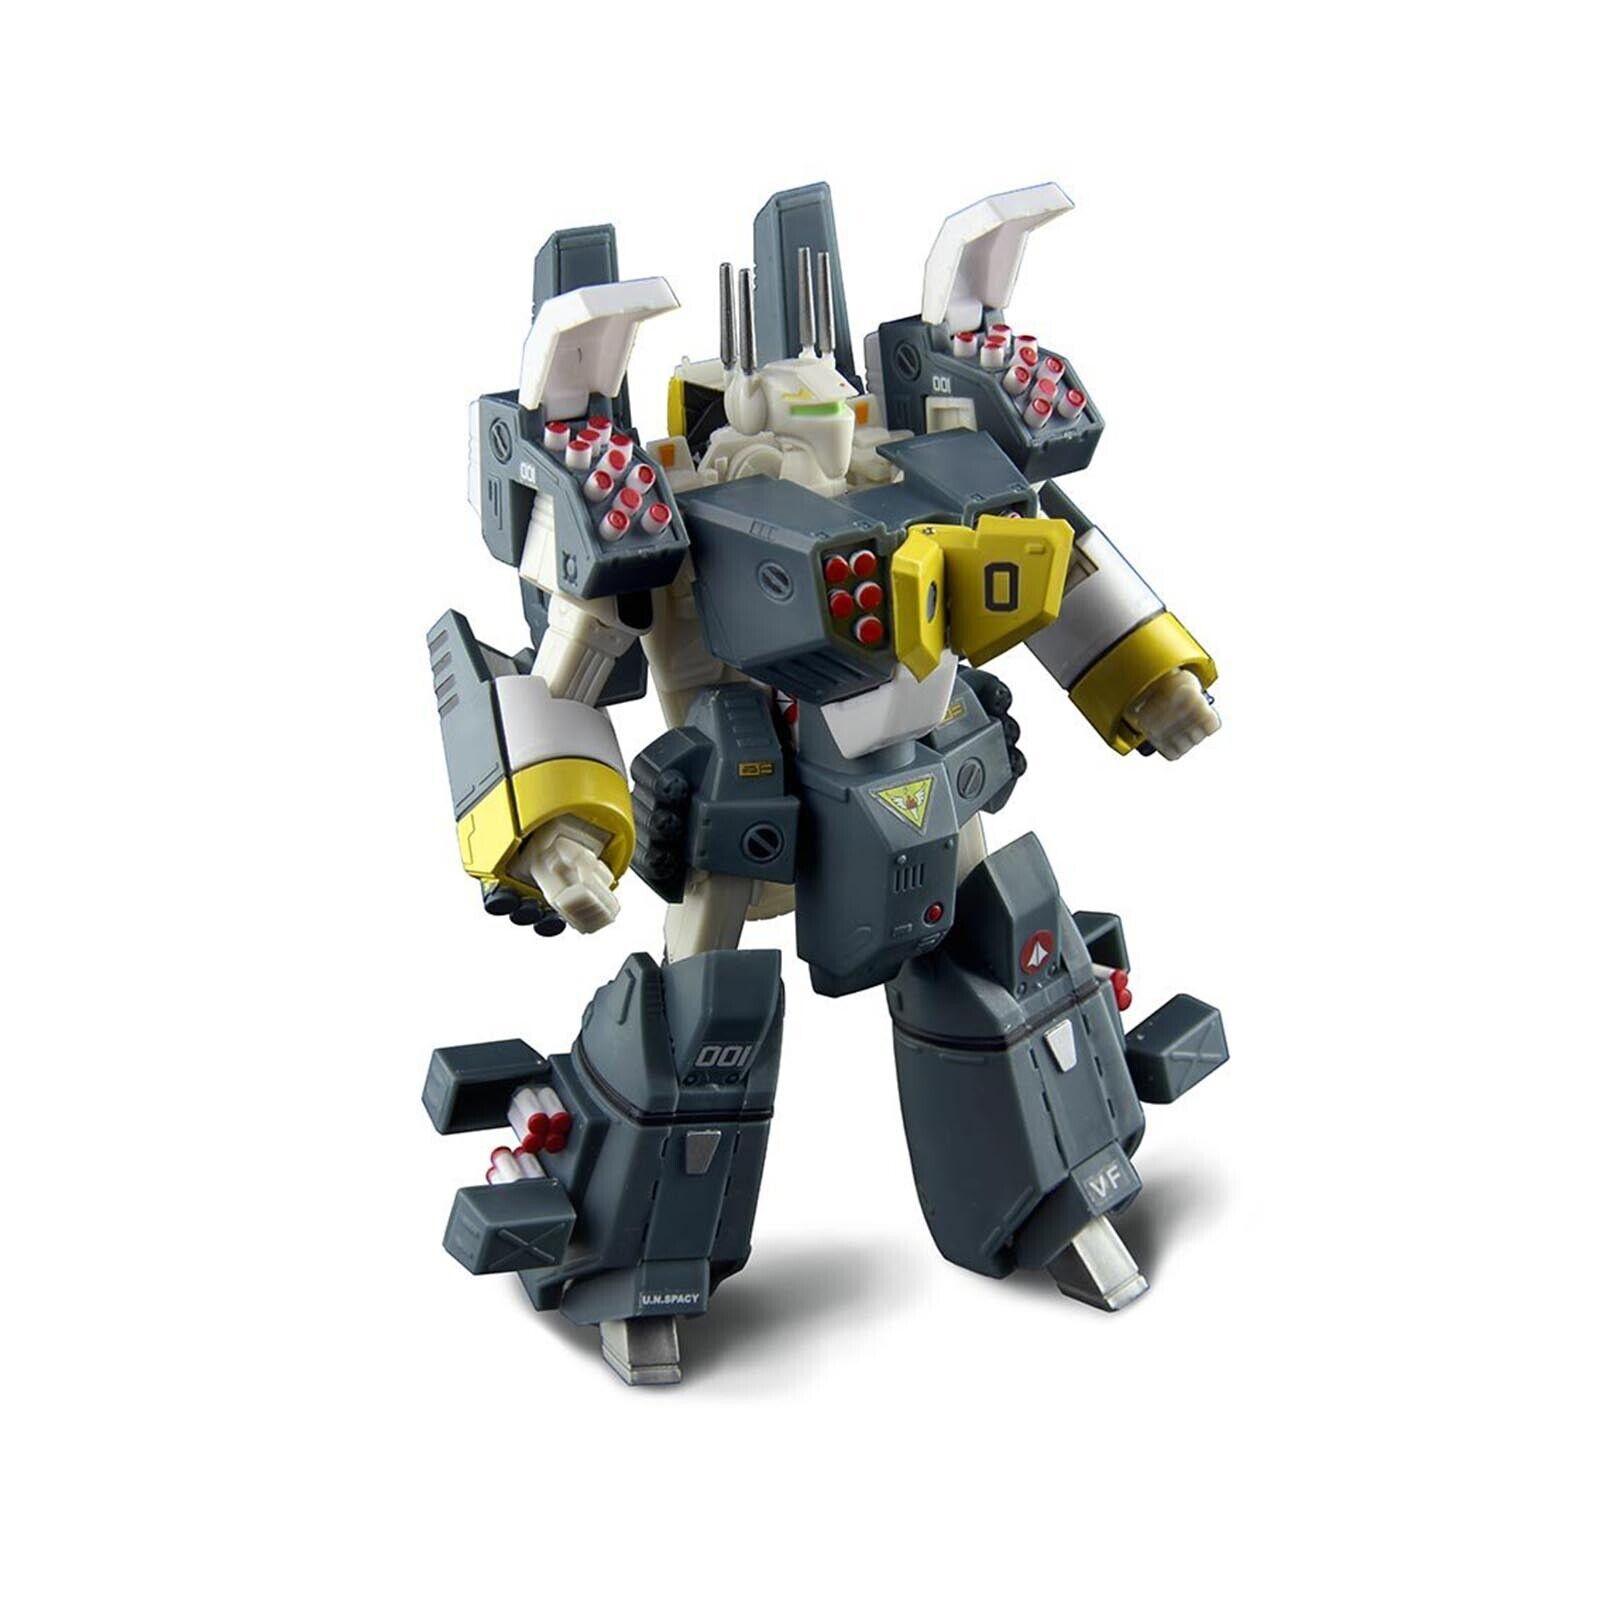 Robotech 30th Anniversary Roy Fokkers GBP-1S GBP-1S GBP-1S Heavy Armor Veritech Set 43f557